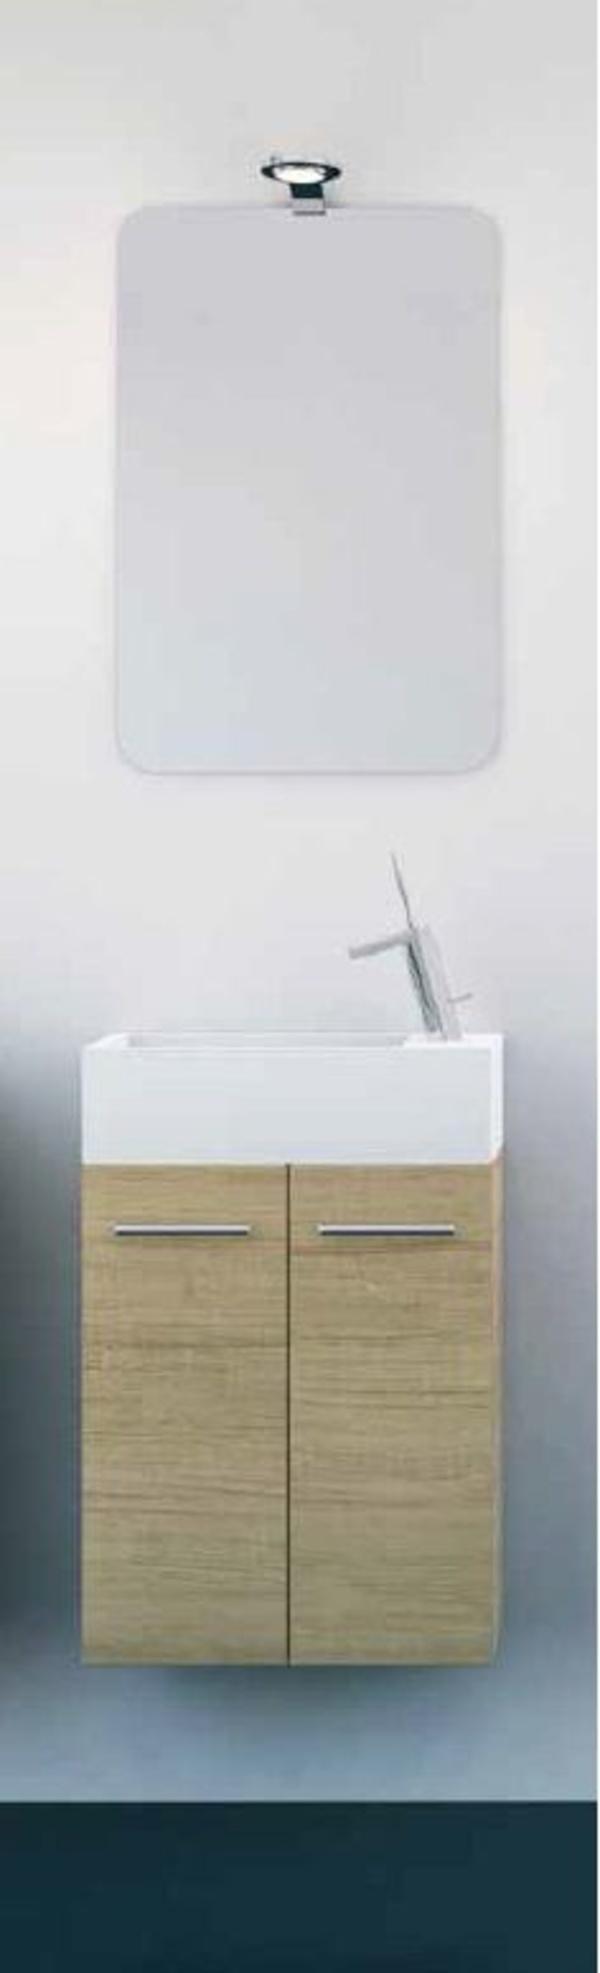 Mueble Pícola C24 de 2 puertas, madera roble velado y tirador asa recta